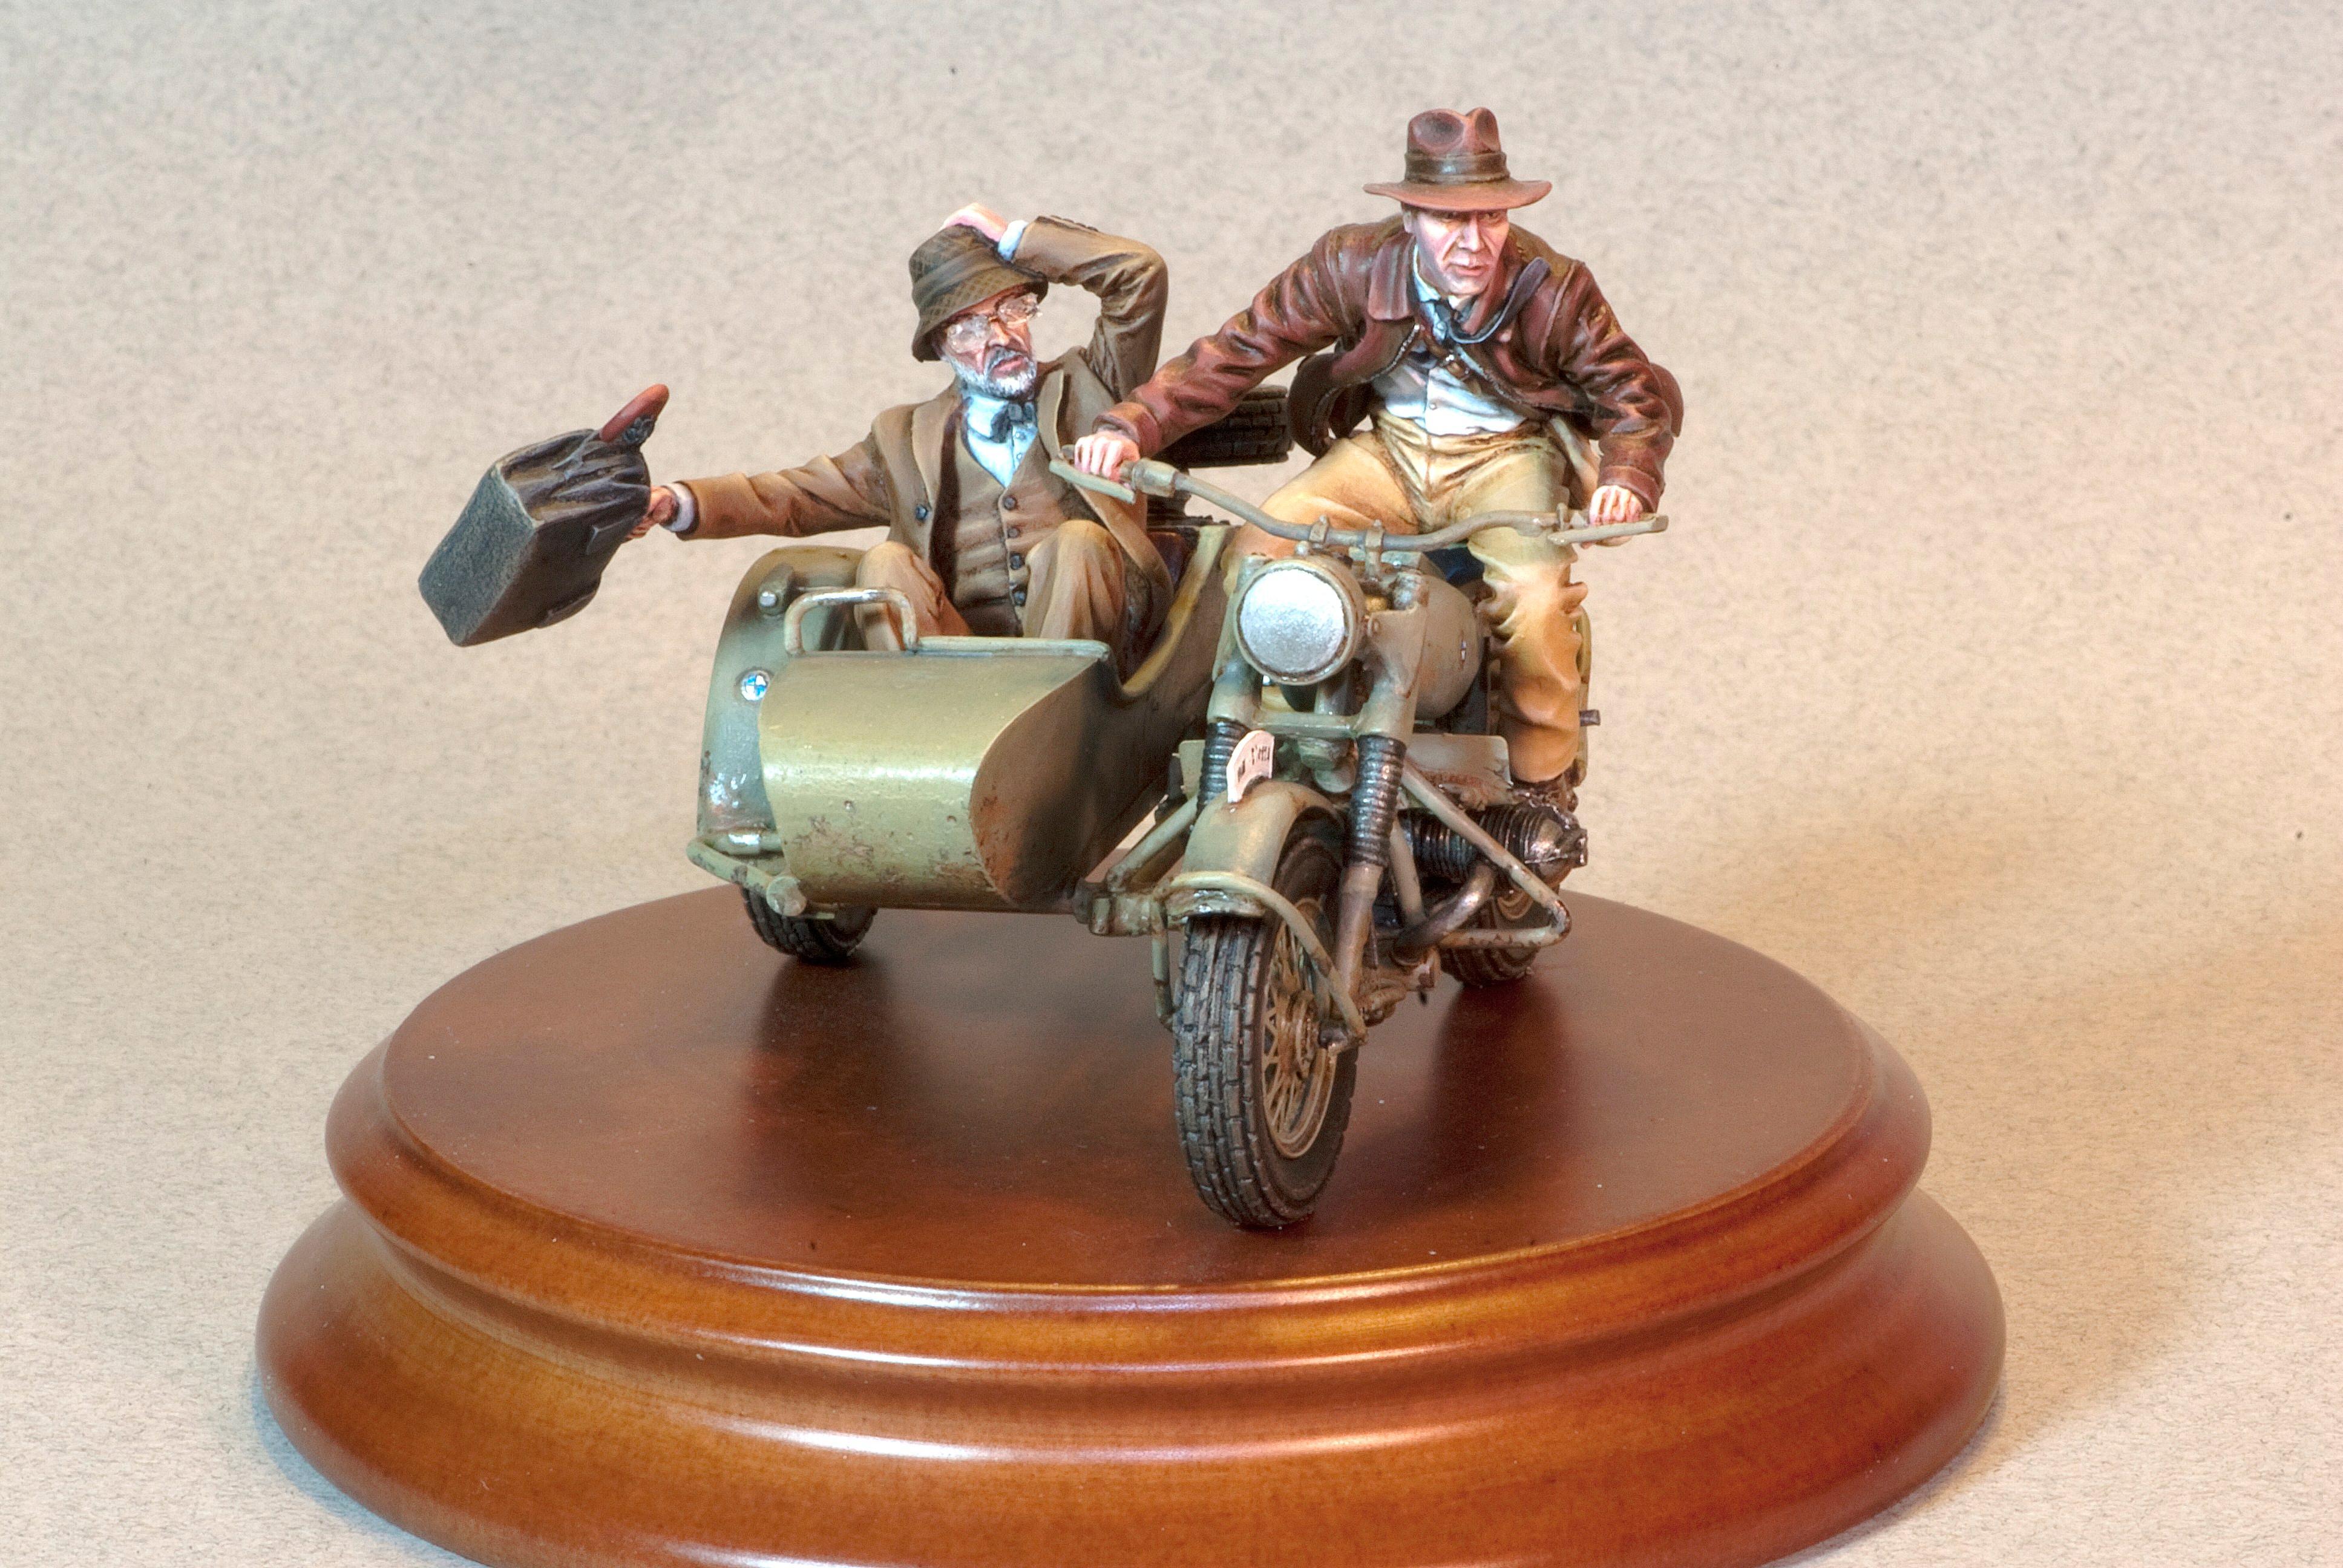 Henry Jones, Indiana Jones, Last Crusade, Motorcycle, Nazis, Sidecar